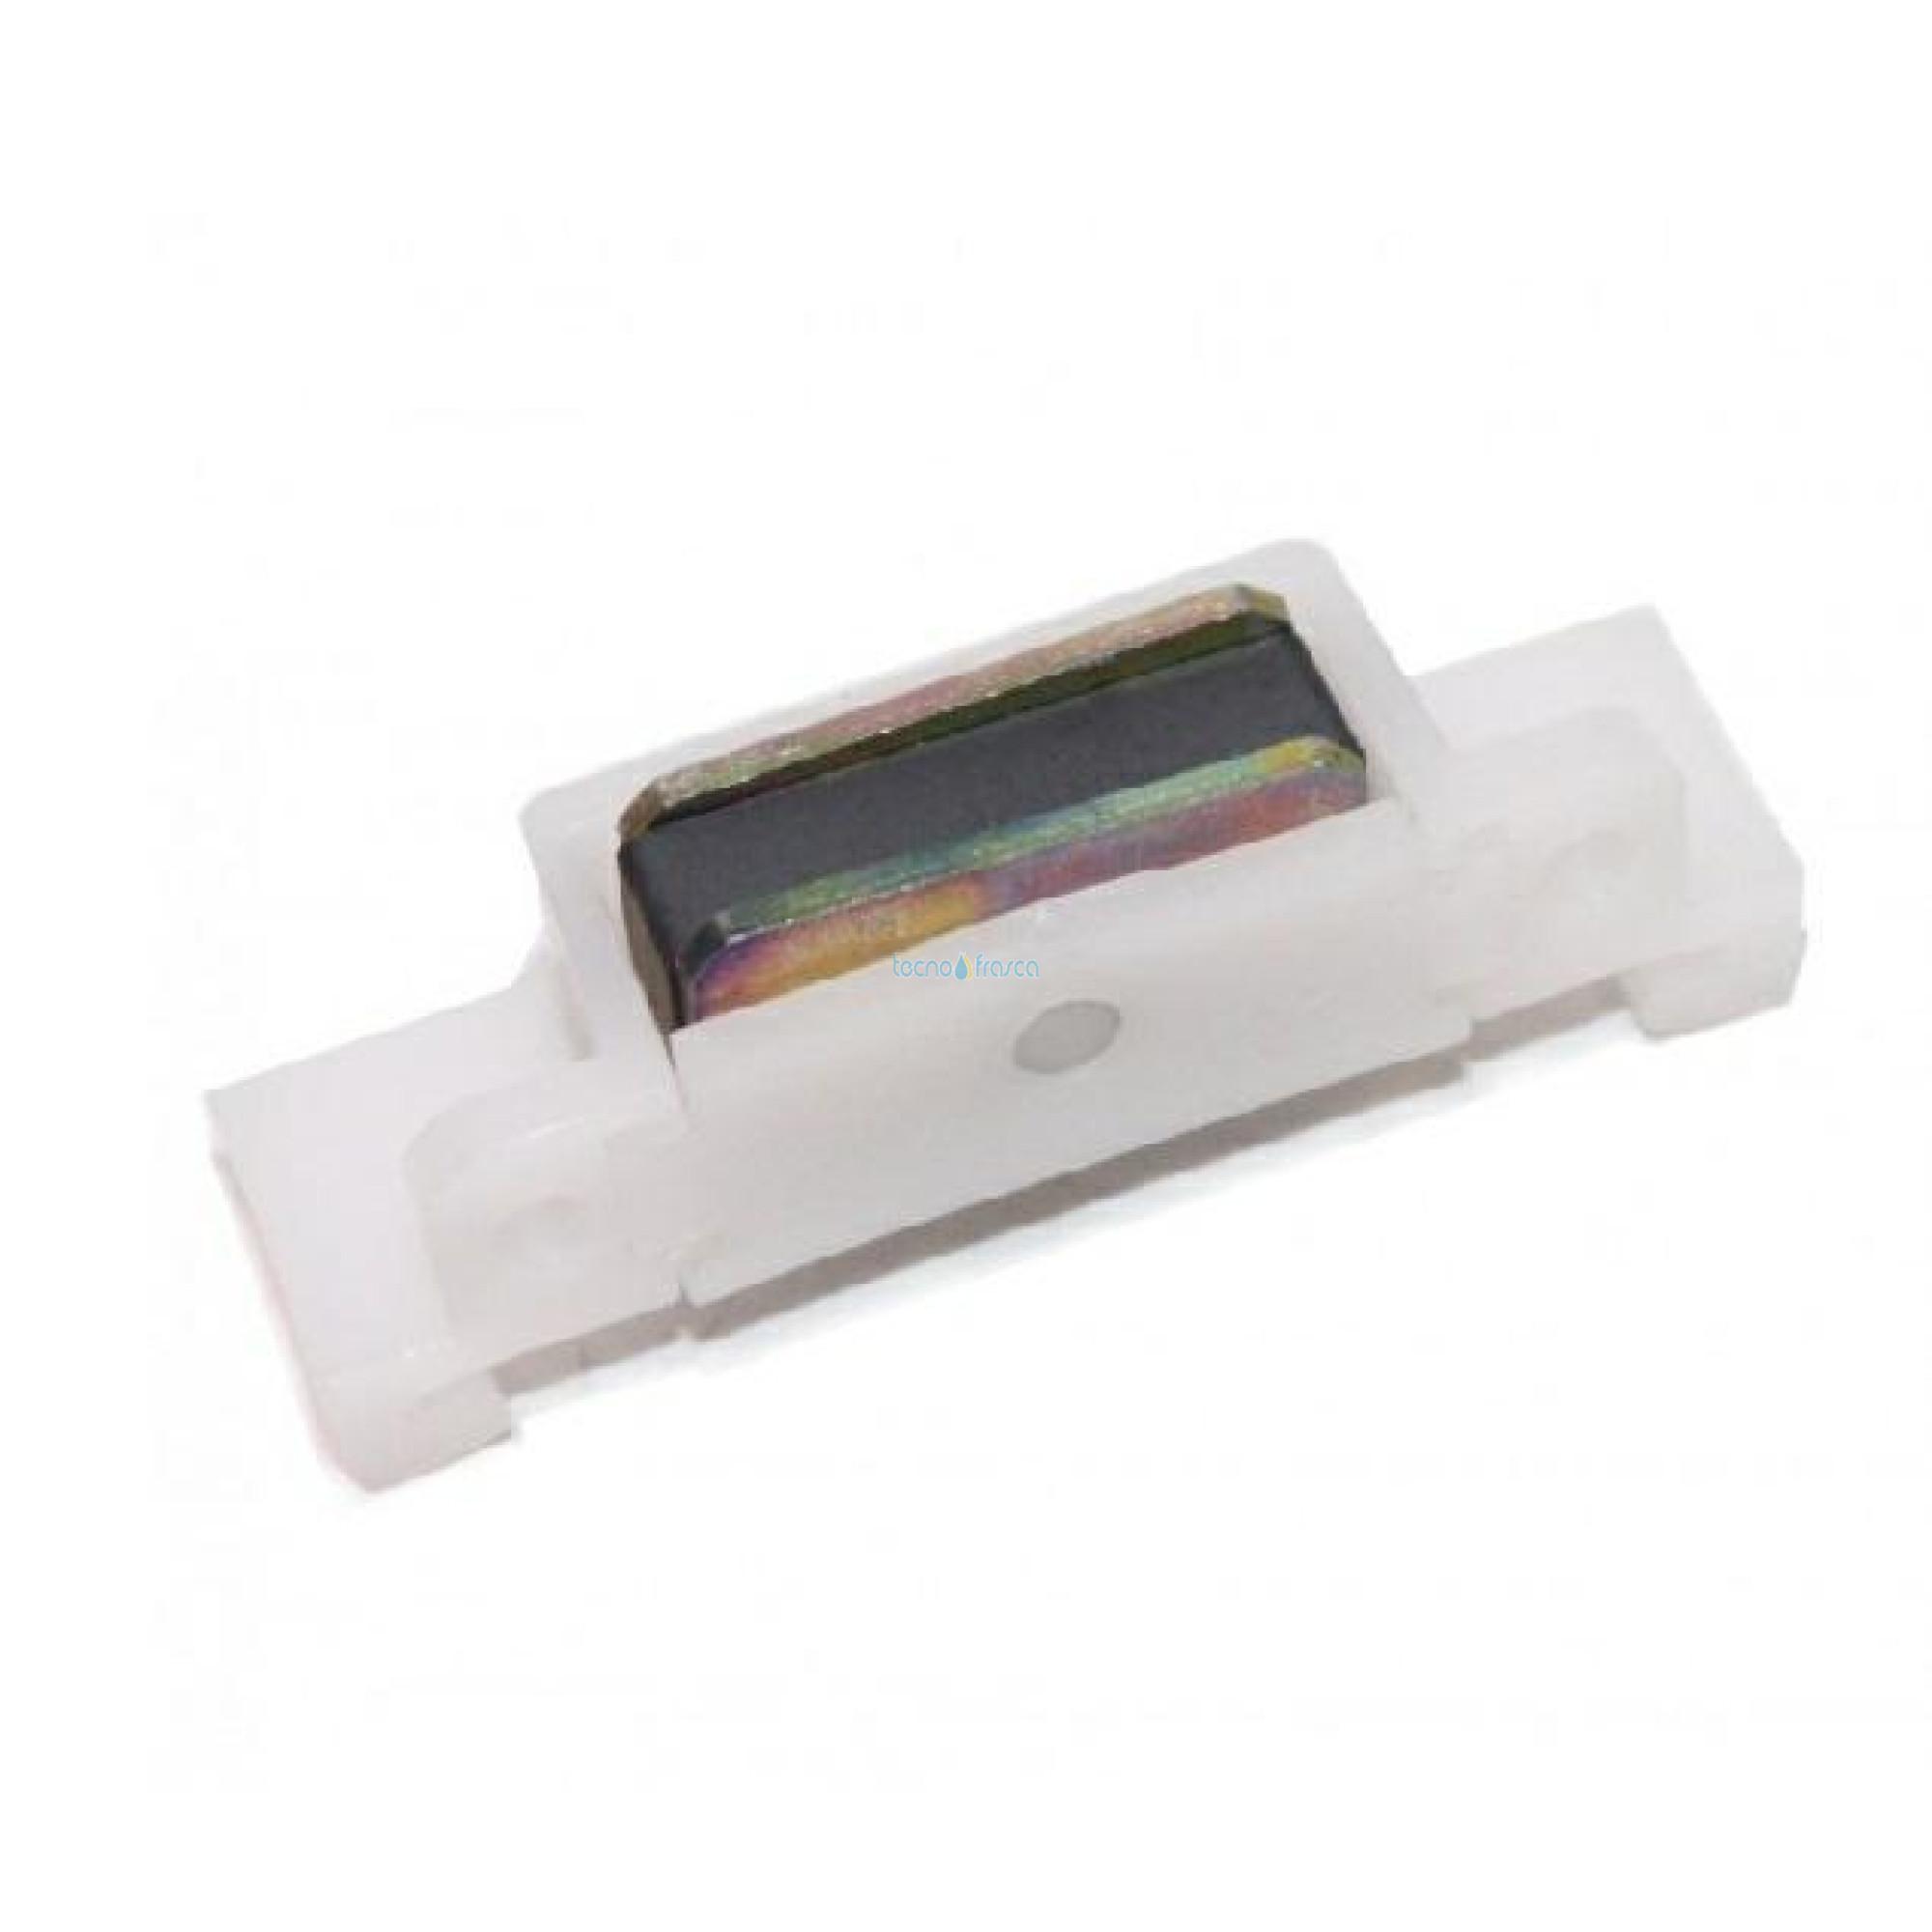 Vaillant magnete di chiusura 0020107724